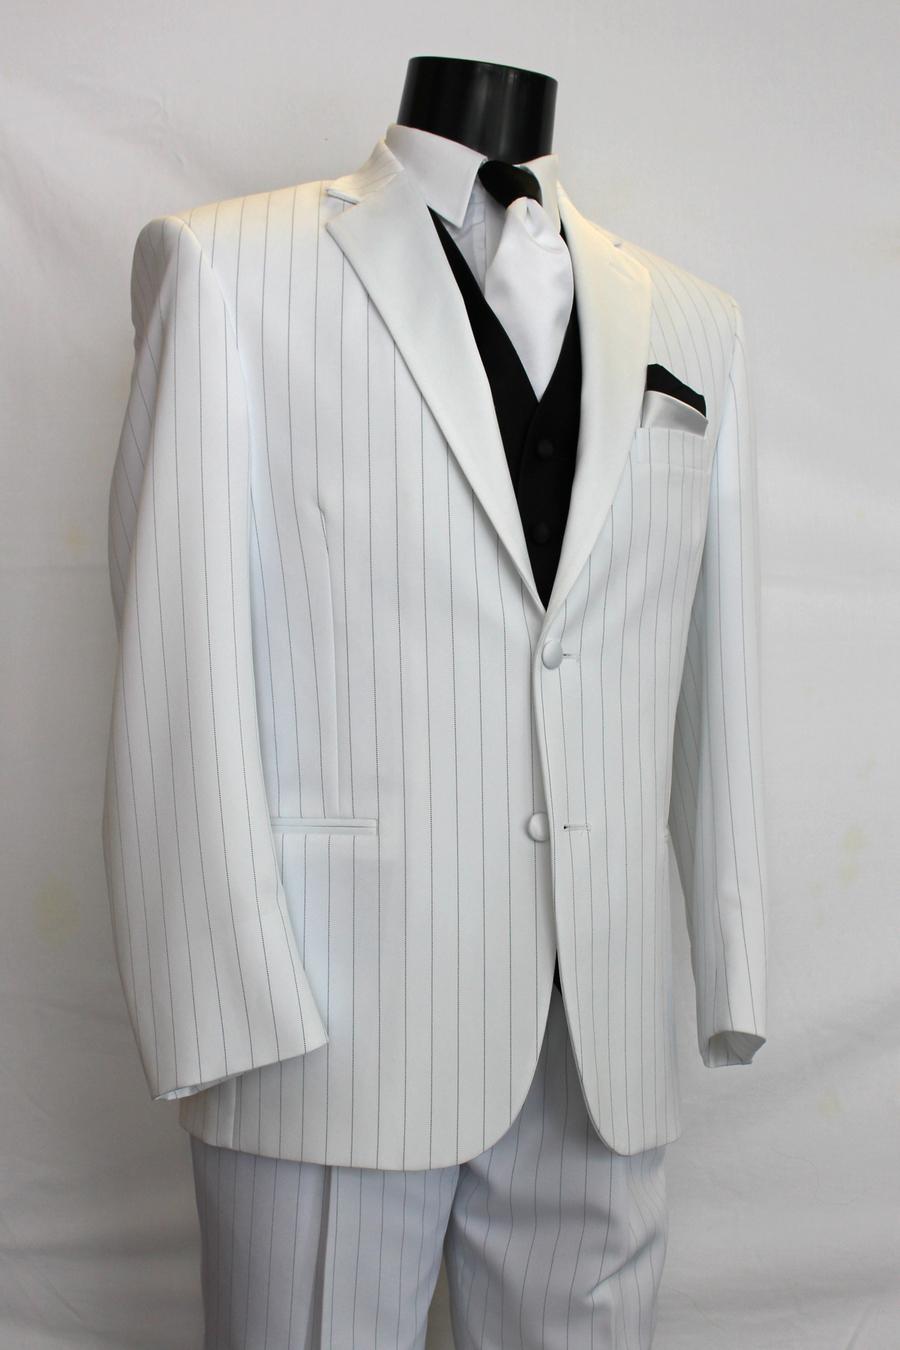 Free clipart white tuxedo. Suit necktie shirt black